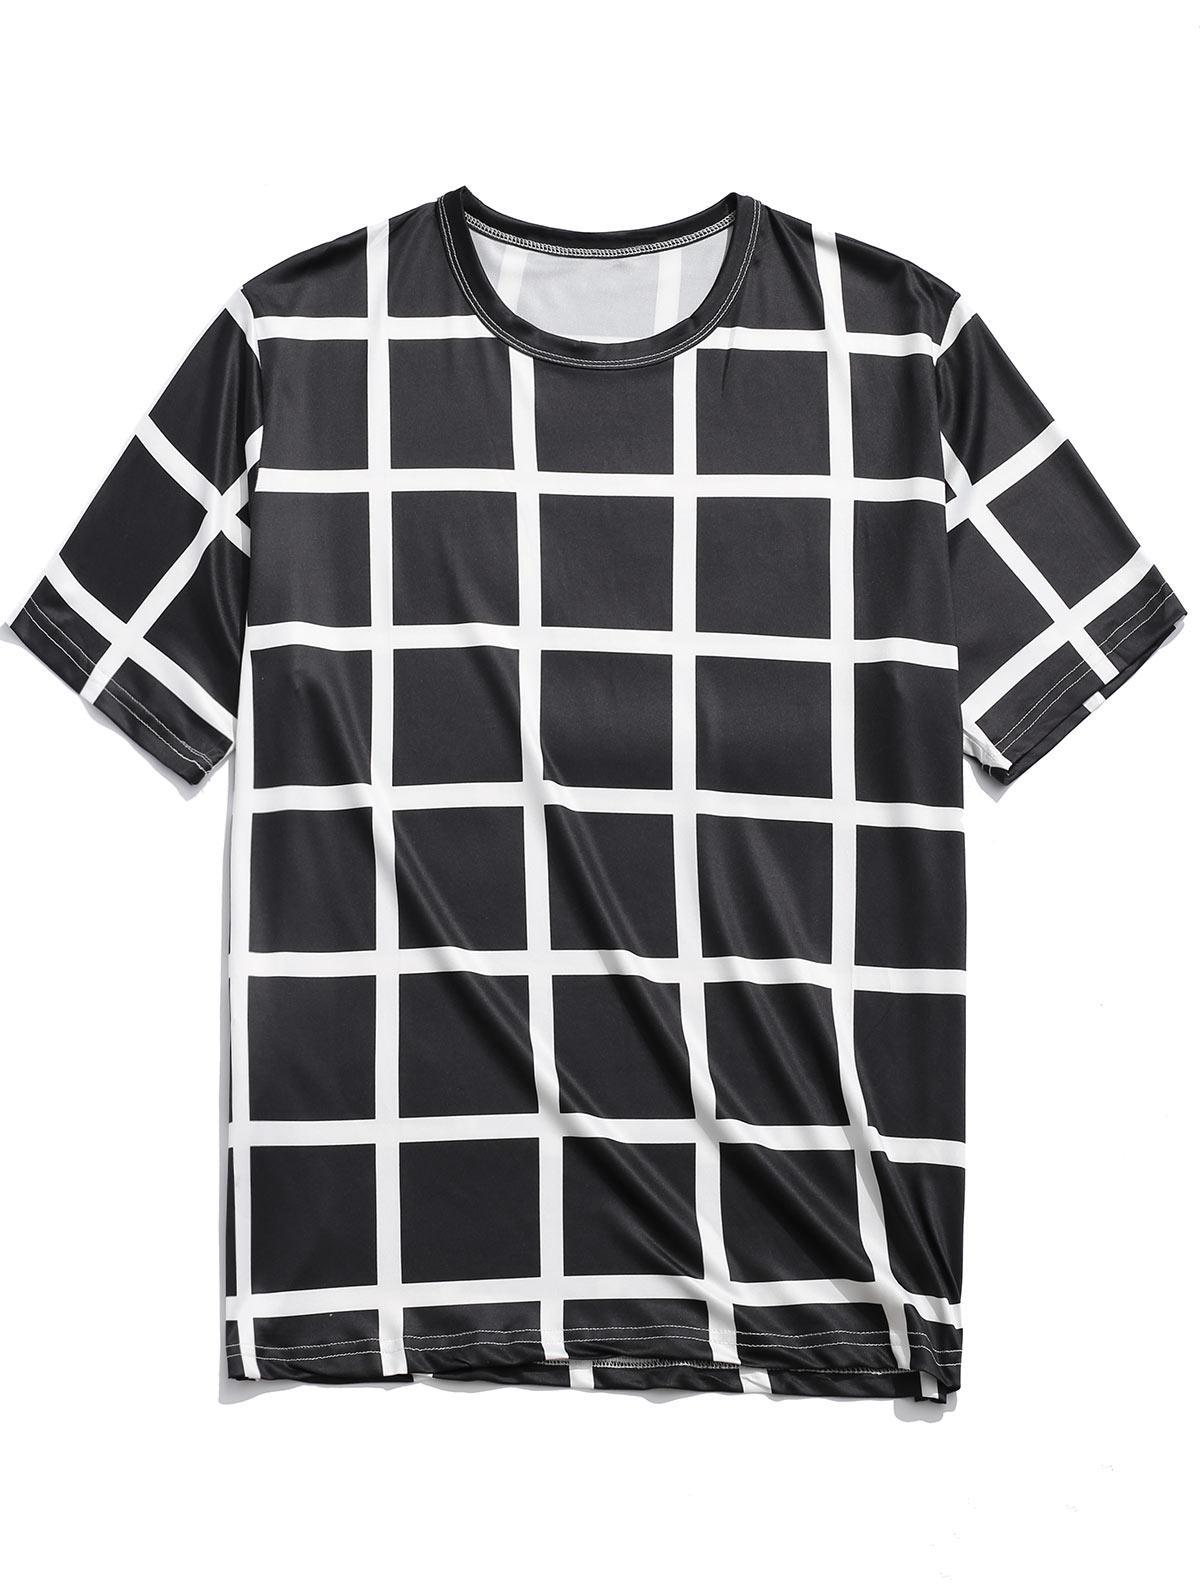 Allover Stampa Plaid Casual Manica Corta T-shirt